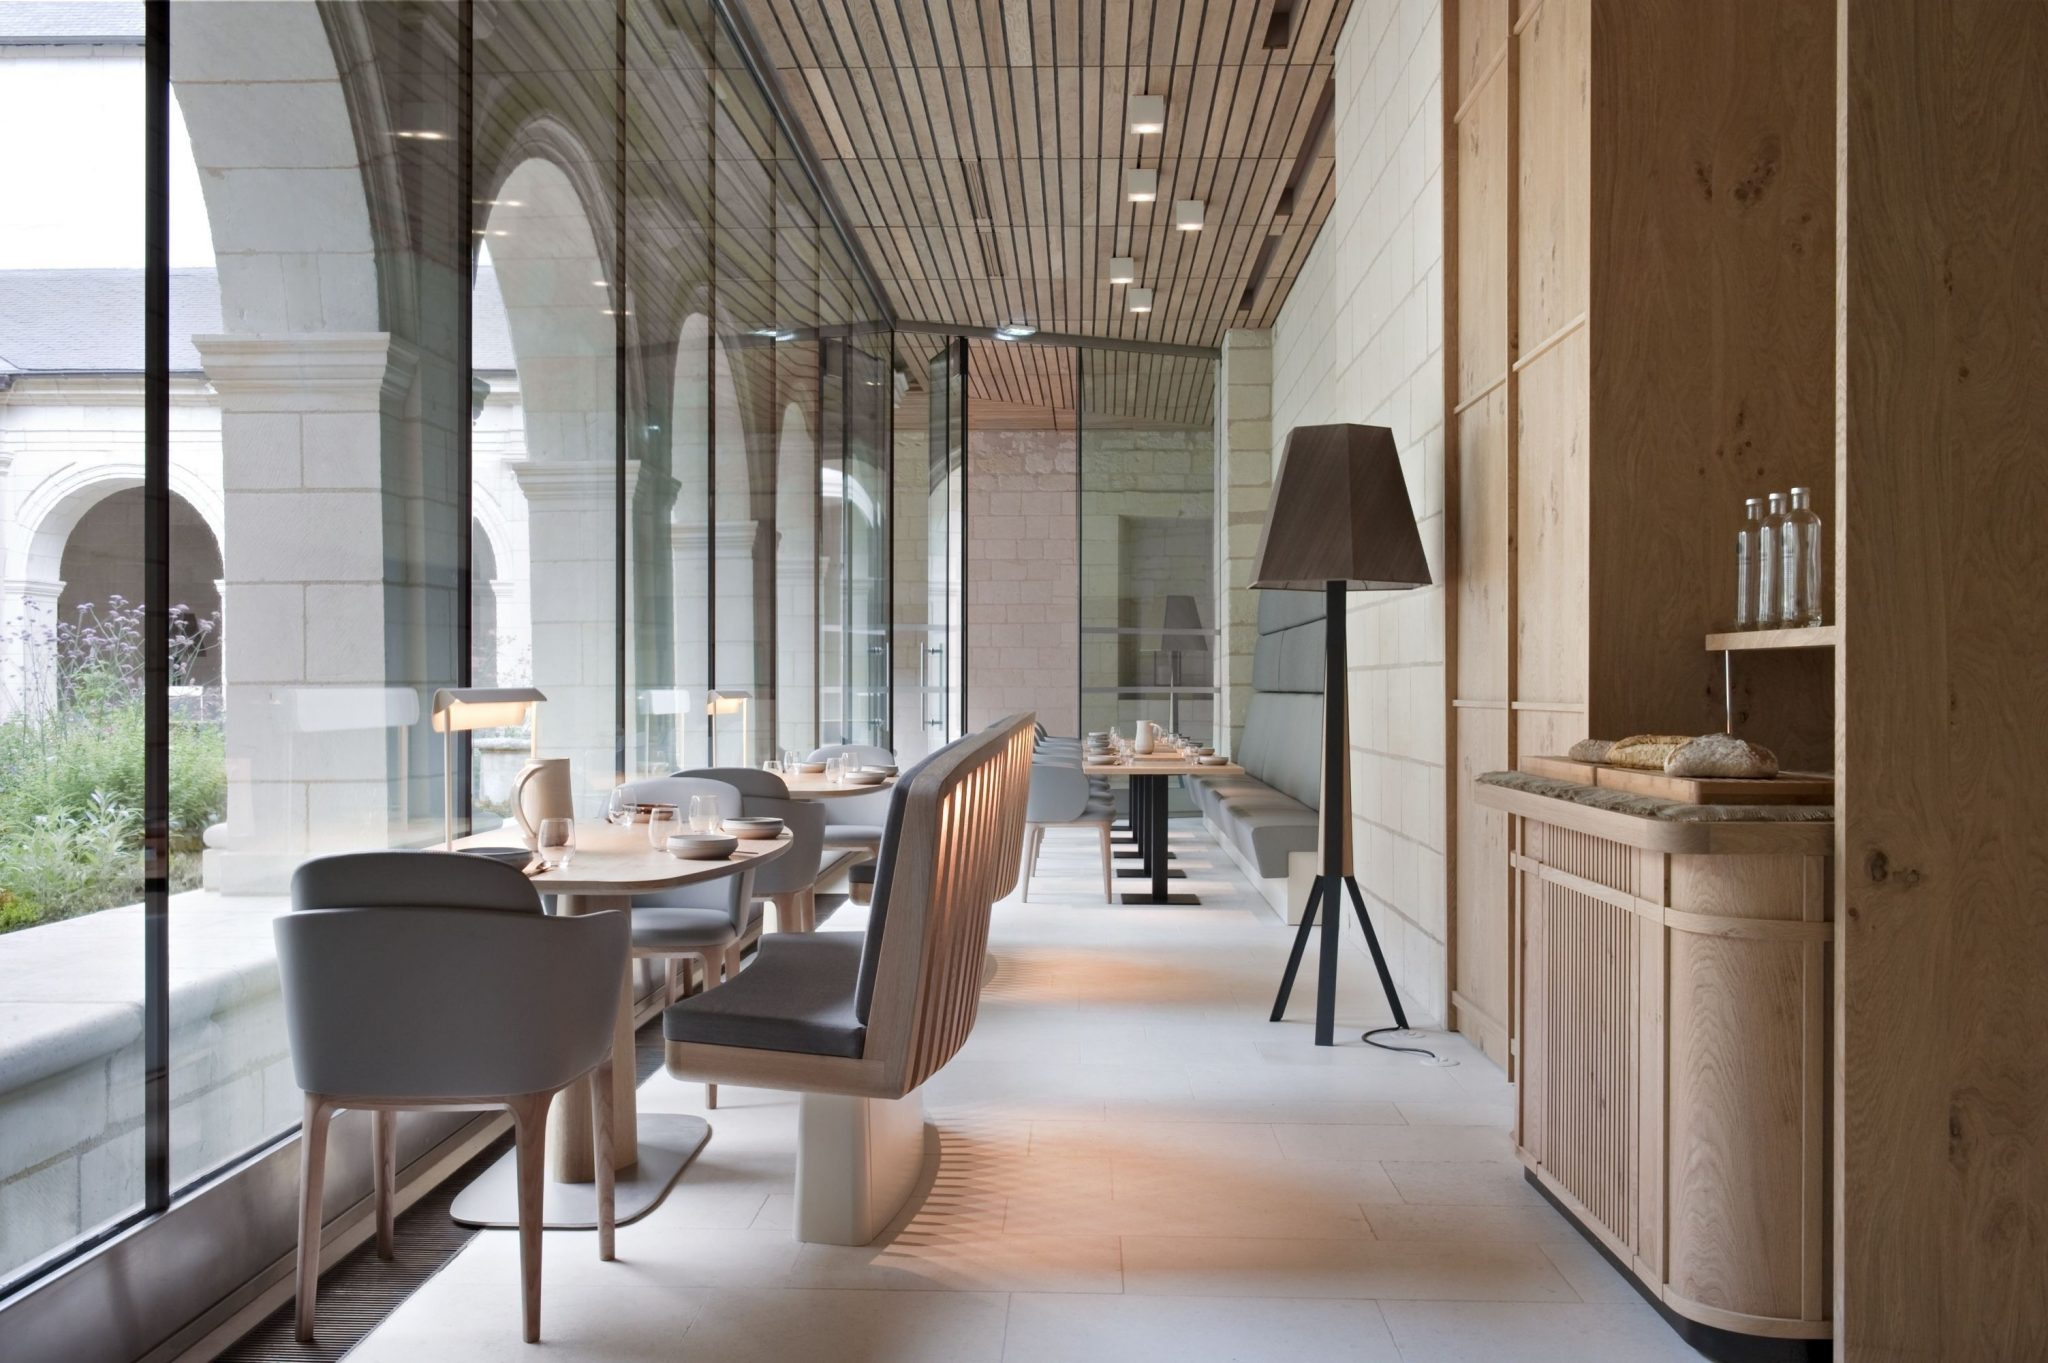 Inspirational Interior Designers Patrick Jouin_Abbaye de Fontevraud - The Restaurant & iBar